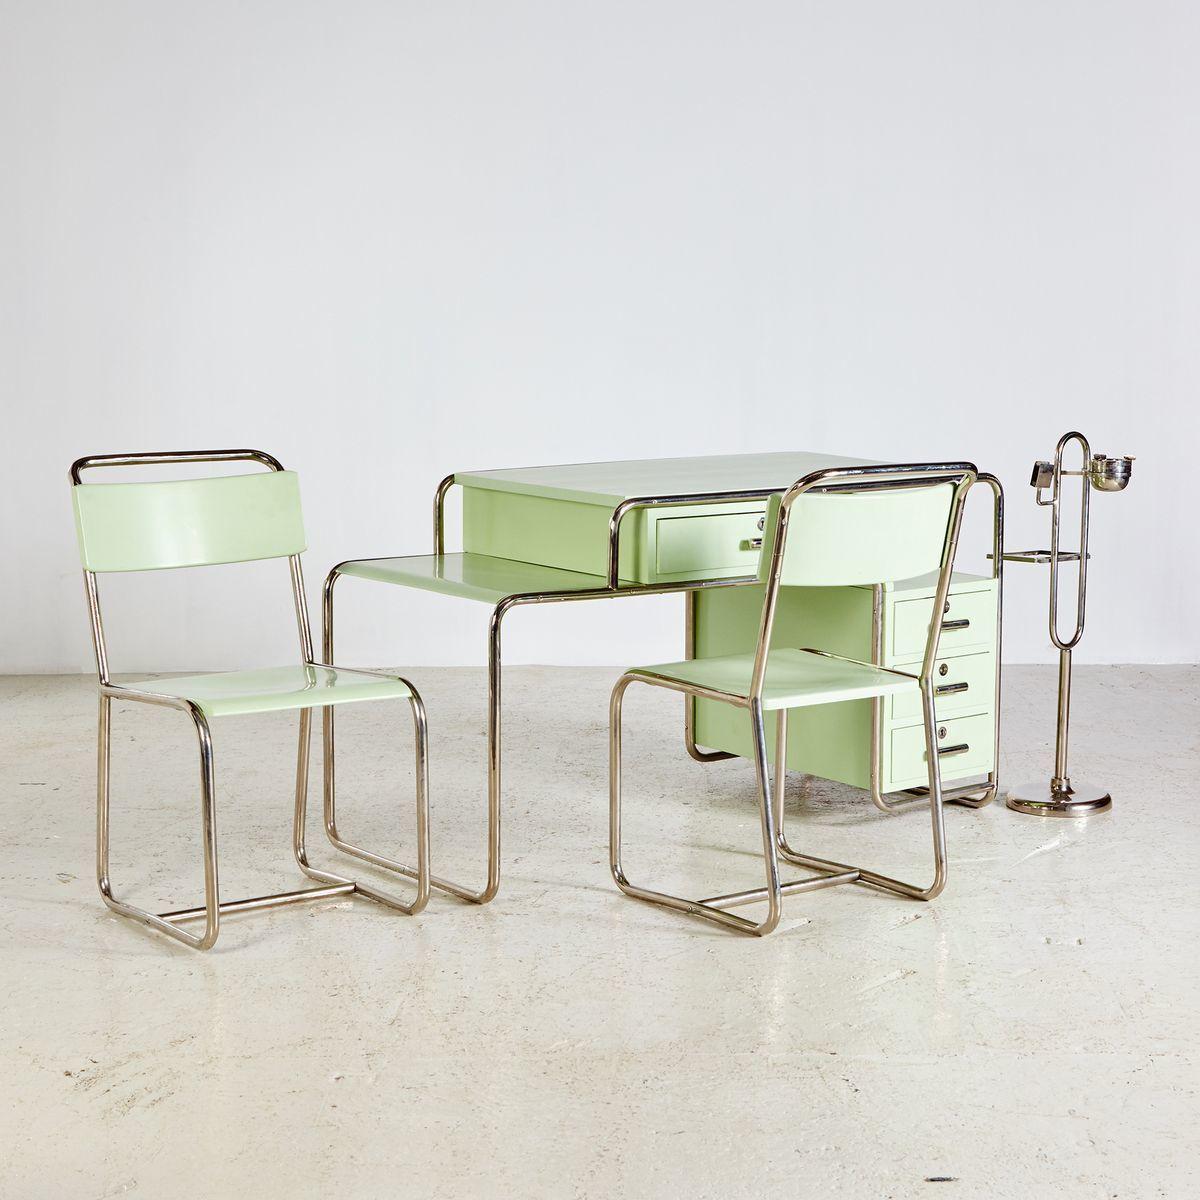 Bauhaus Style Green Work Room Set From Ideal Tubular